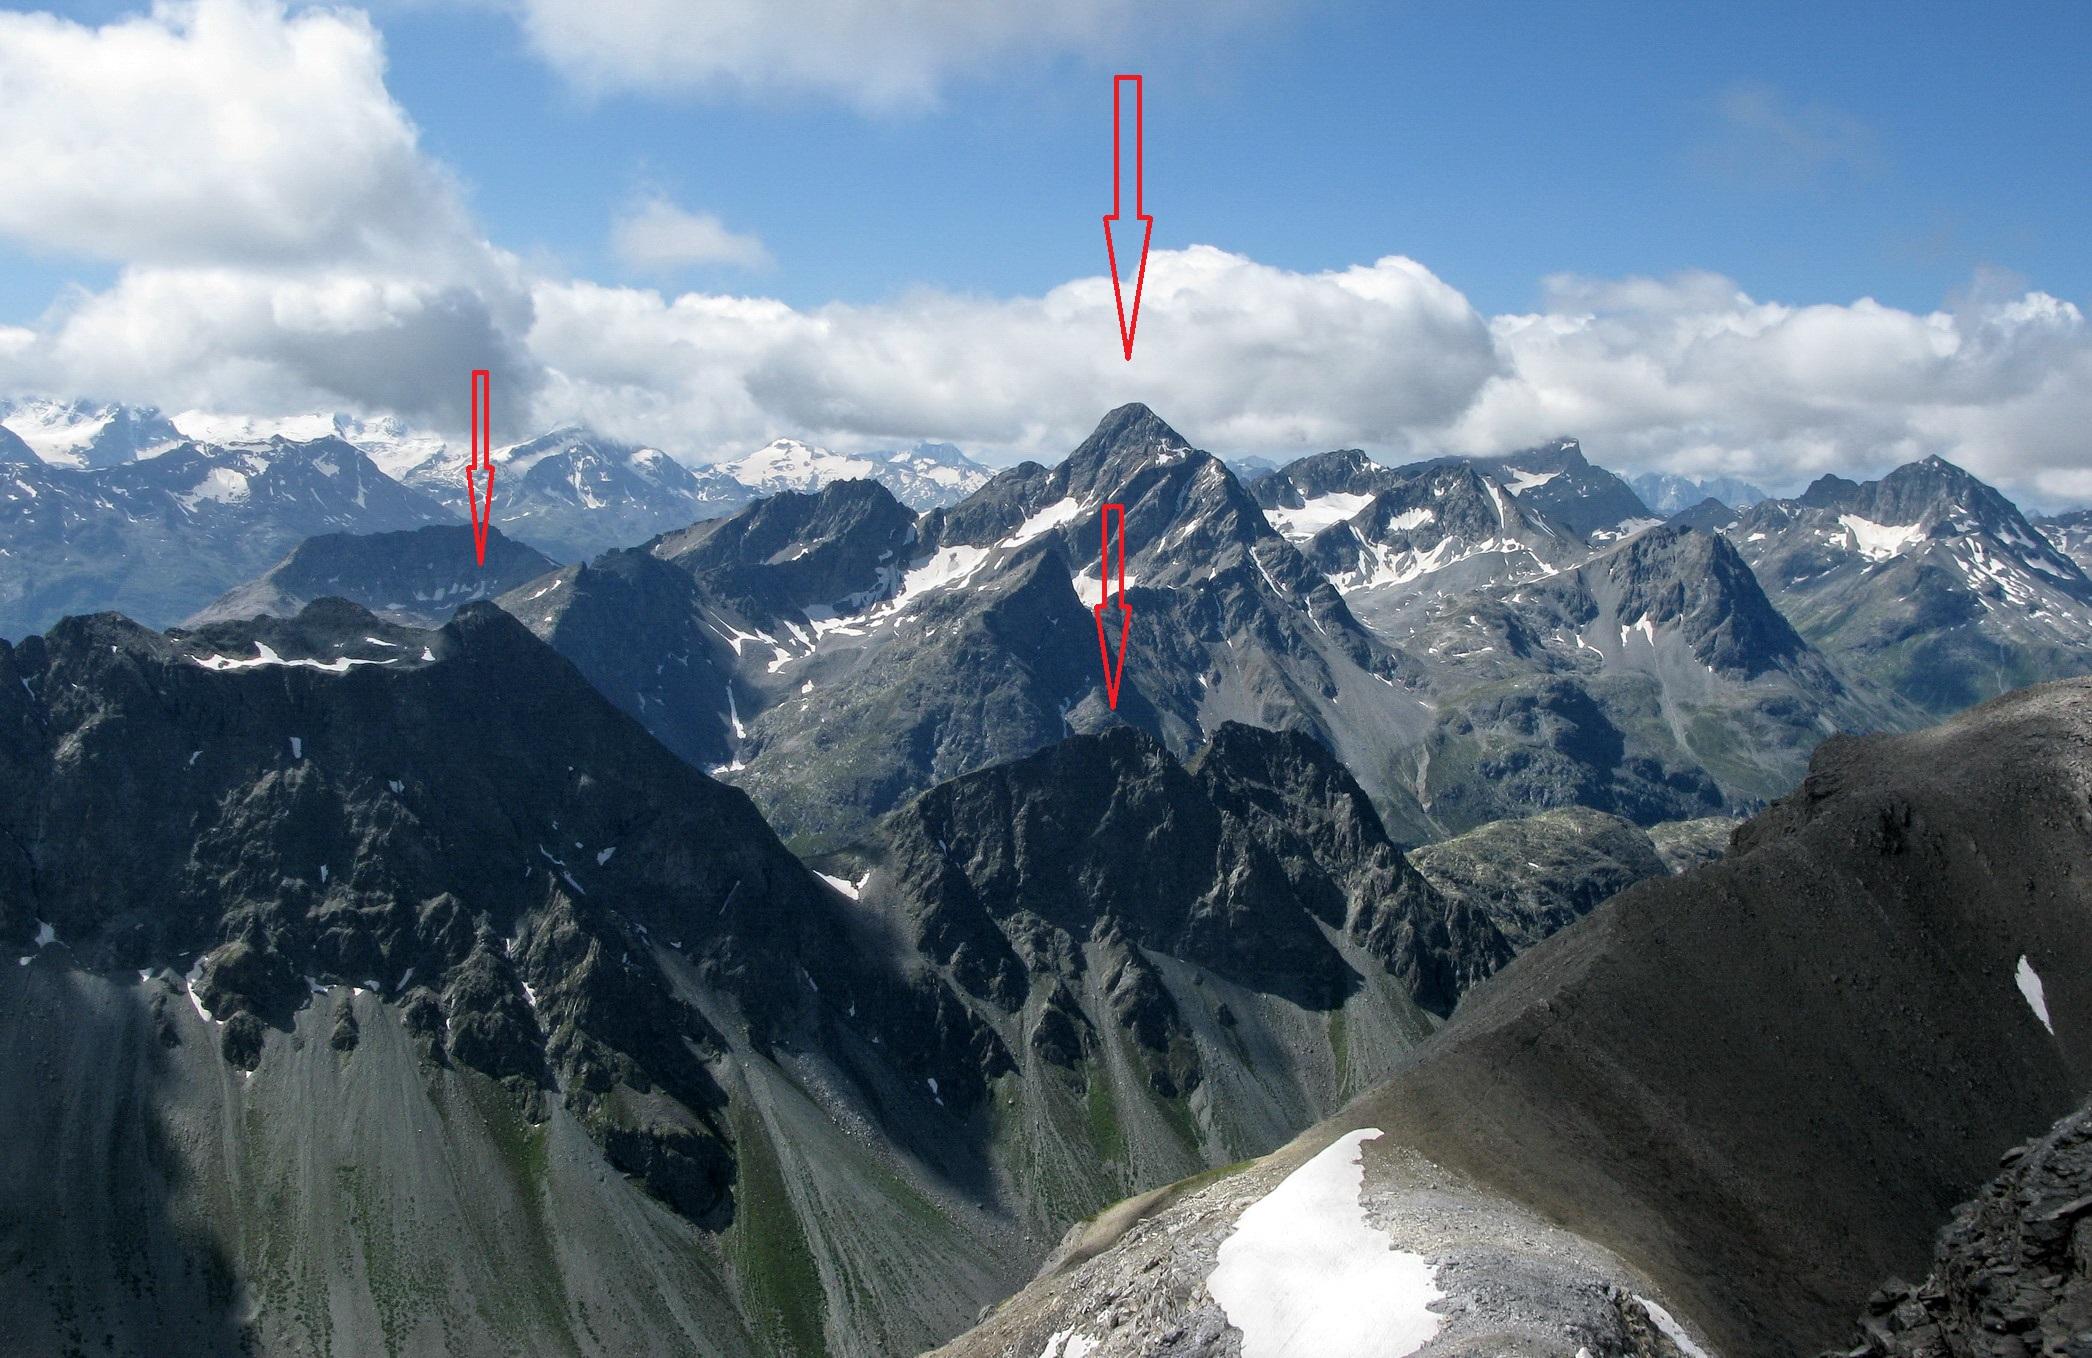 zľava:_Blais,_hore_v_pozadí:_Piz_Ot,_pod_ním_šípka_ukazuje_na_ľavý_vrchol_dvojičiek_(Dschimels_2781)